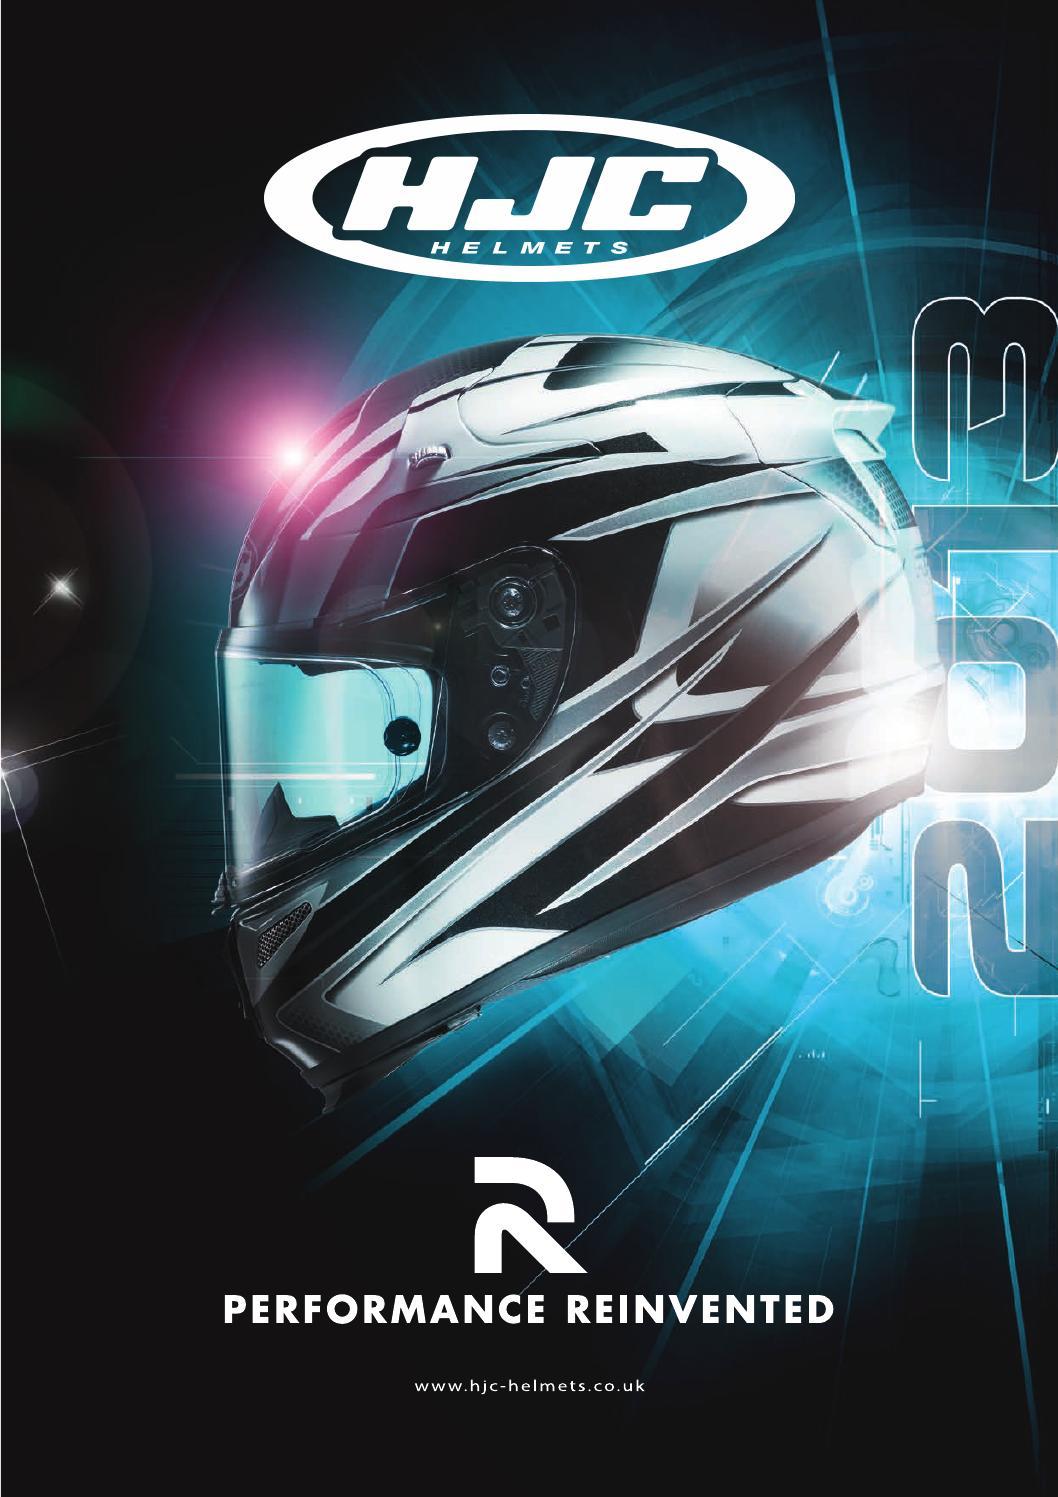 Clear for R-PHA 10 Plue Helmets Bike Racing Motorcycle Helmet Accessories HJC HJ-20P Shield//Visor Gold,Silver,Blue,Smoke,Clear,Pinlock Ready HJC Helmets Made in Korea